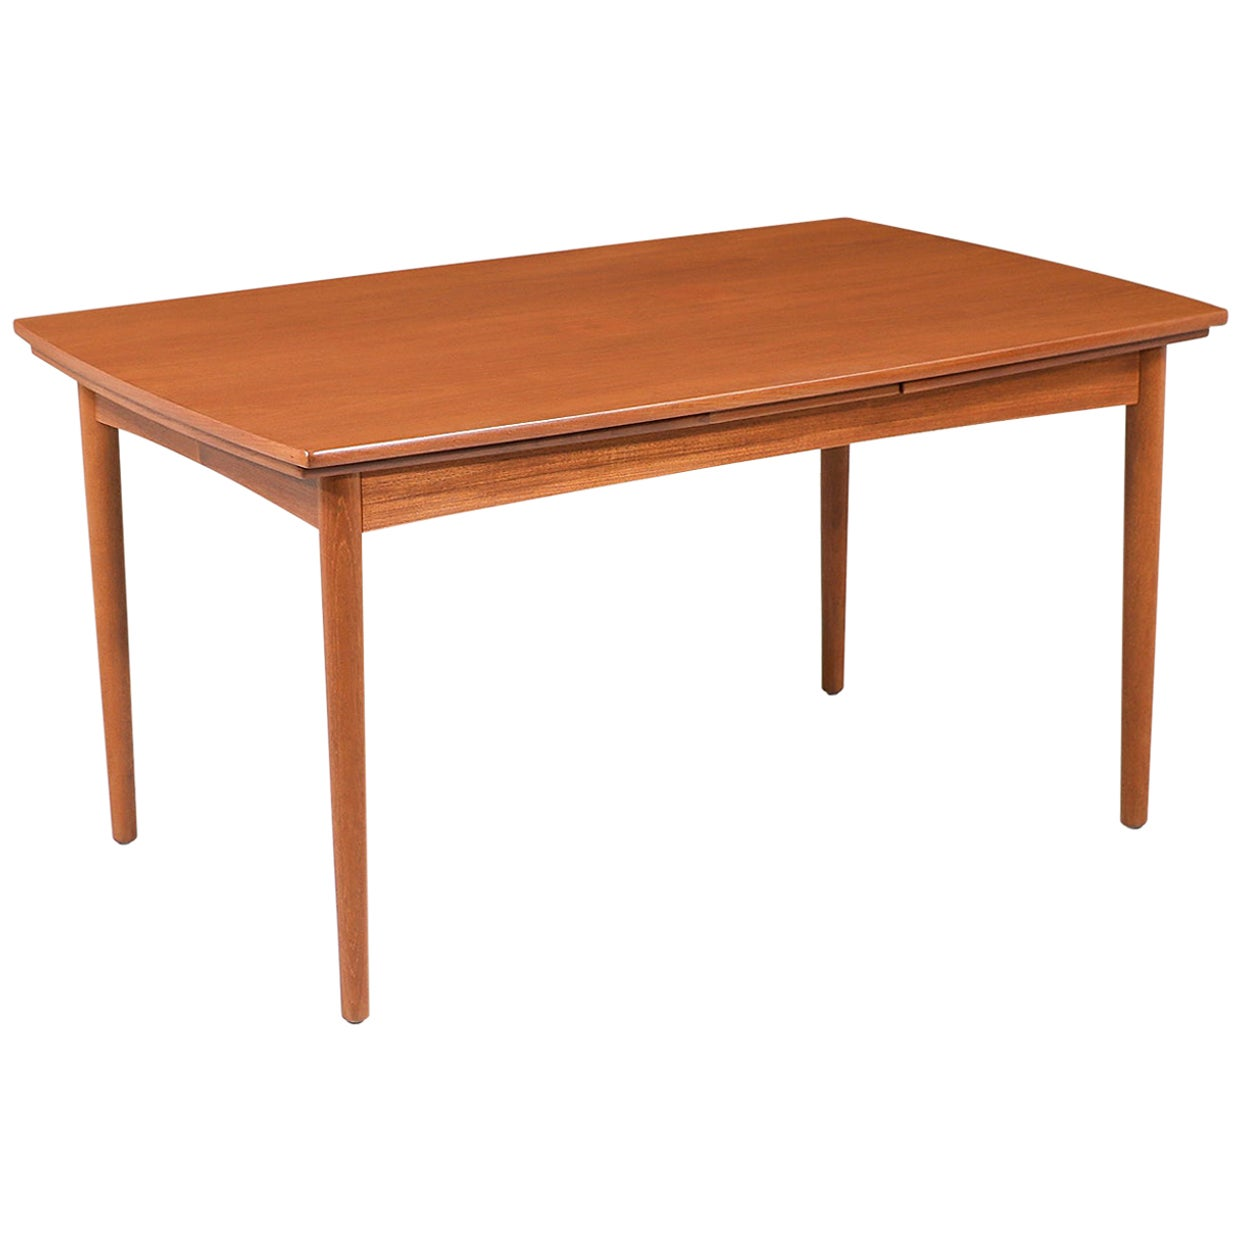 Danish Modern Expanding Draw-Leaf Teak Dining Table